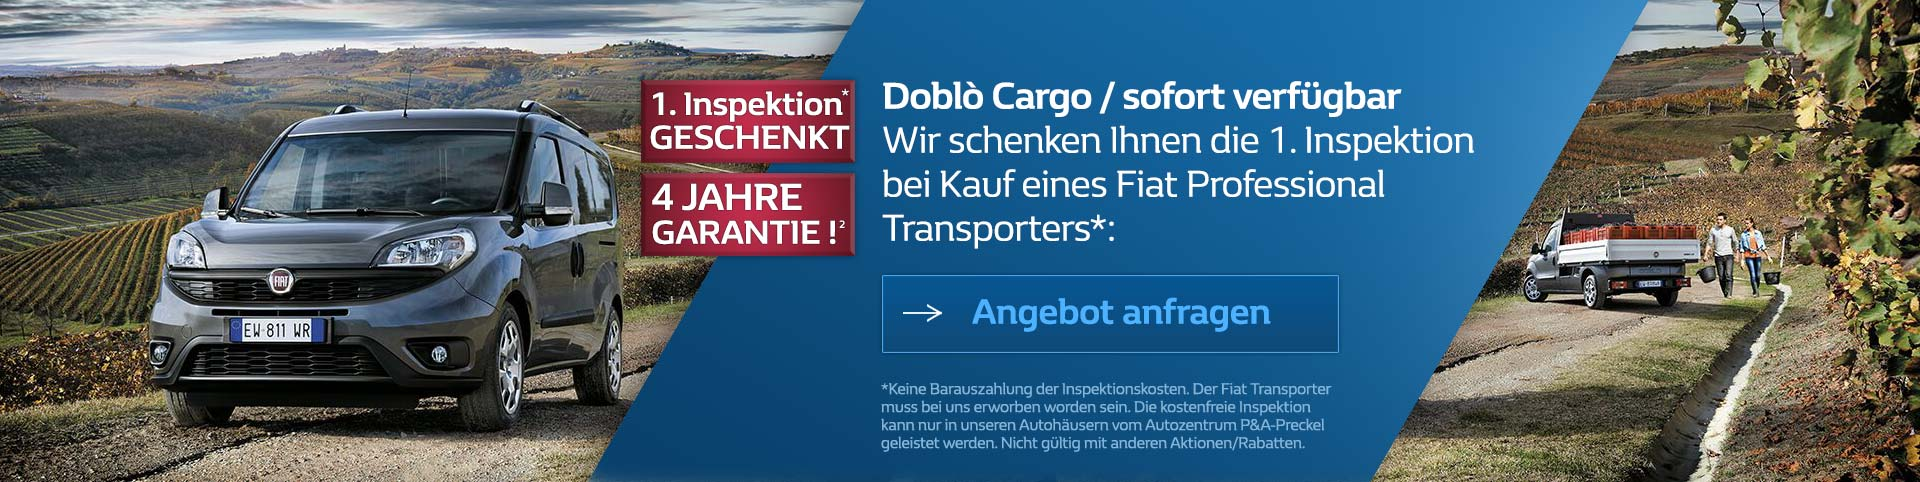 Fiat Doblo Cargo Transporter im Autozentrum P&A